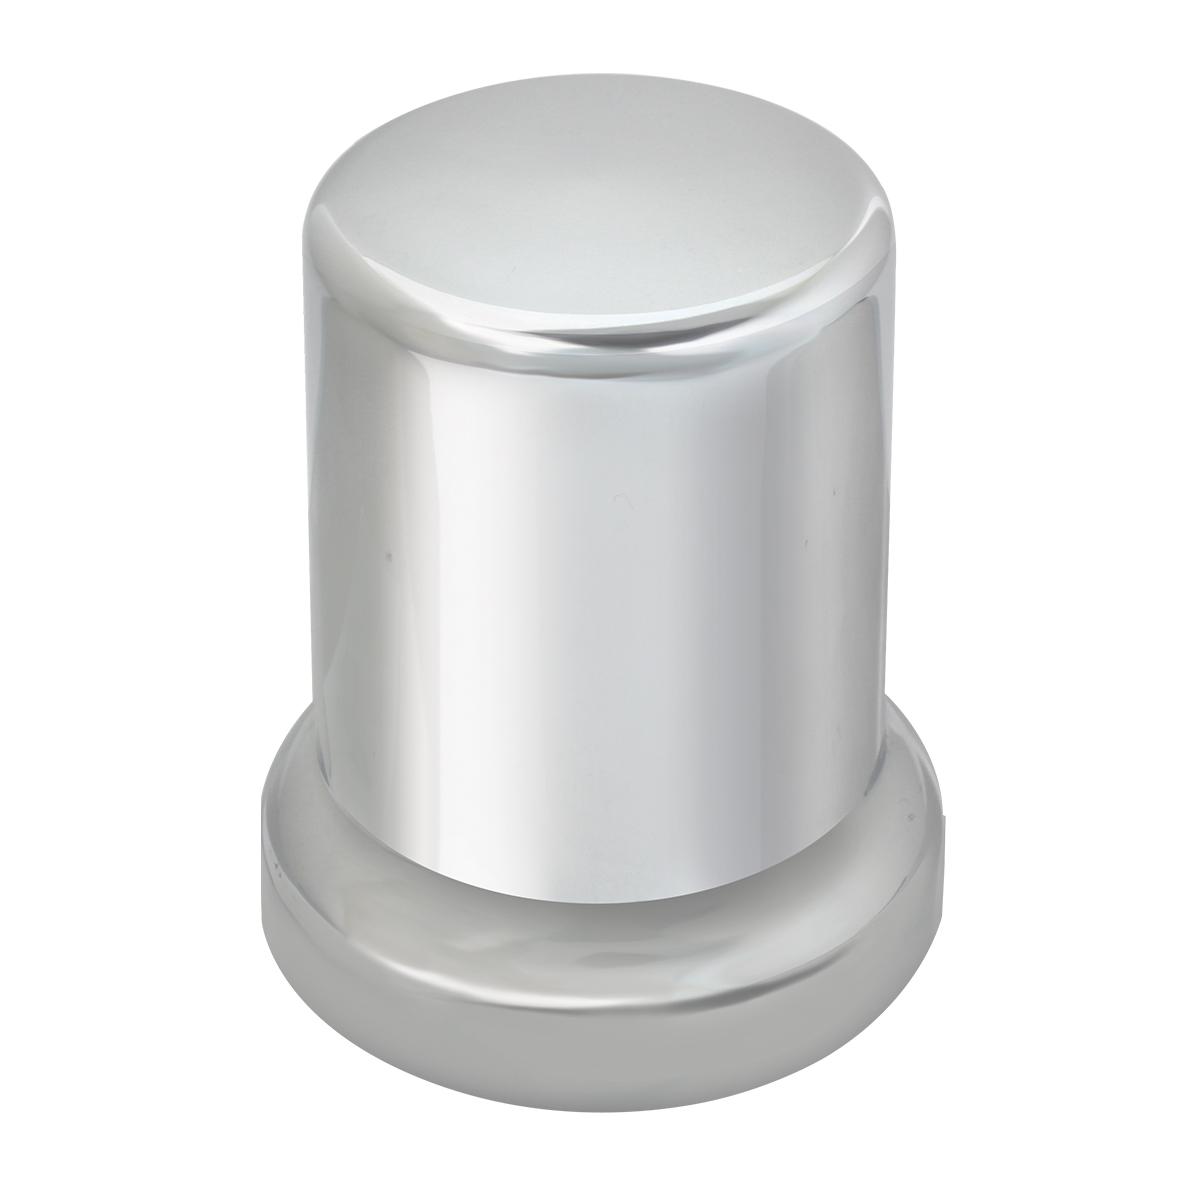 "Tube Chrome Plastic Lug Nut Cover 2-1/2"""